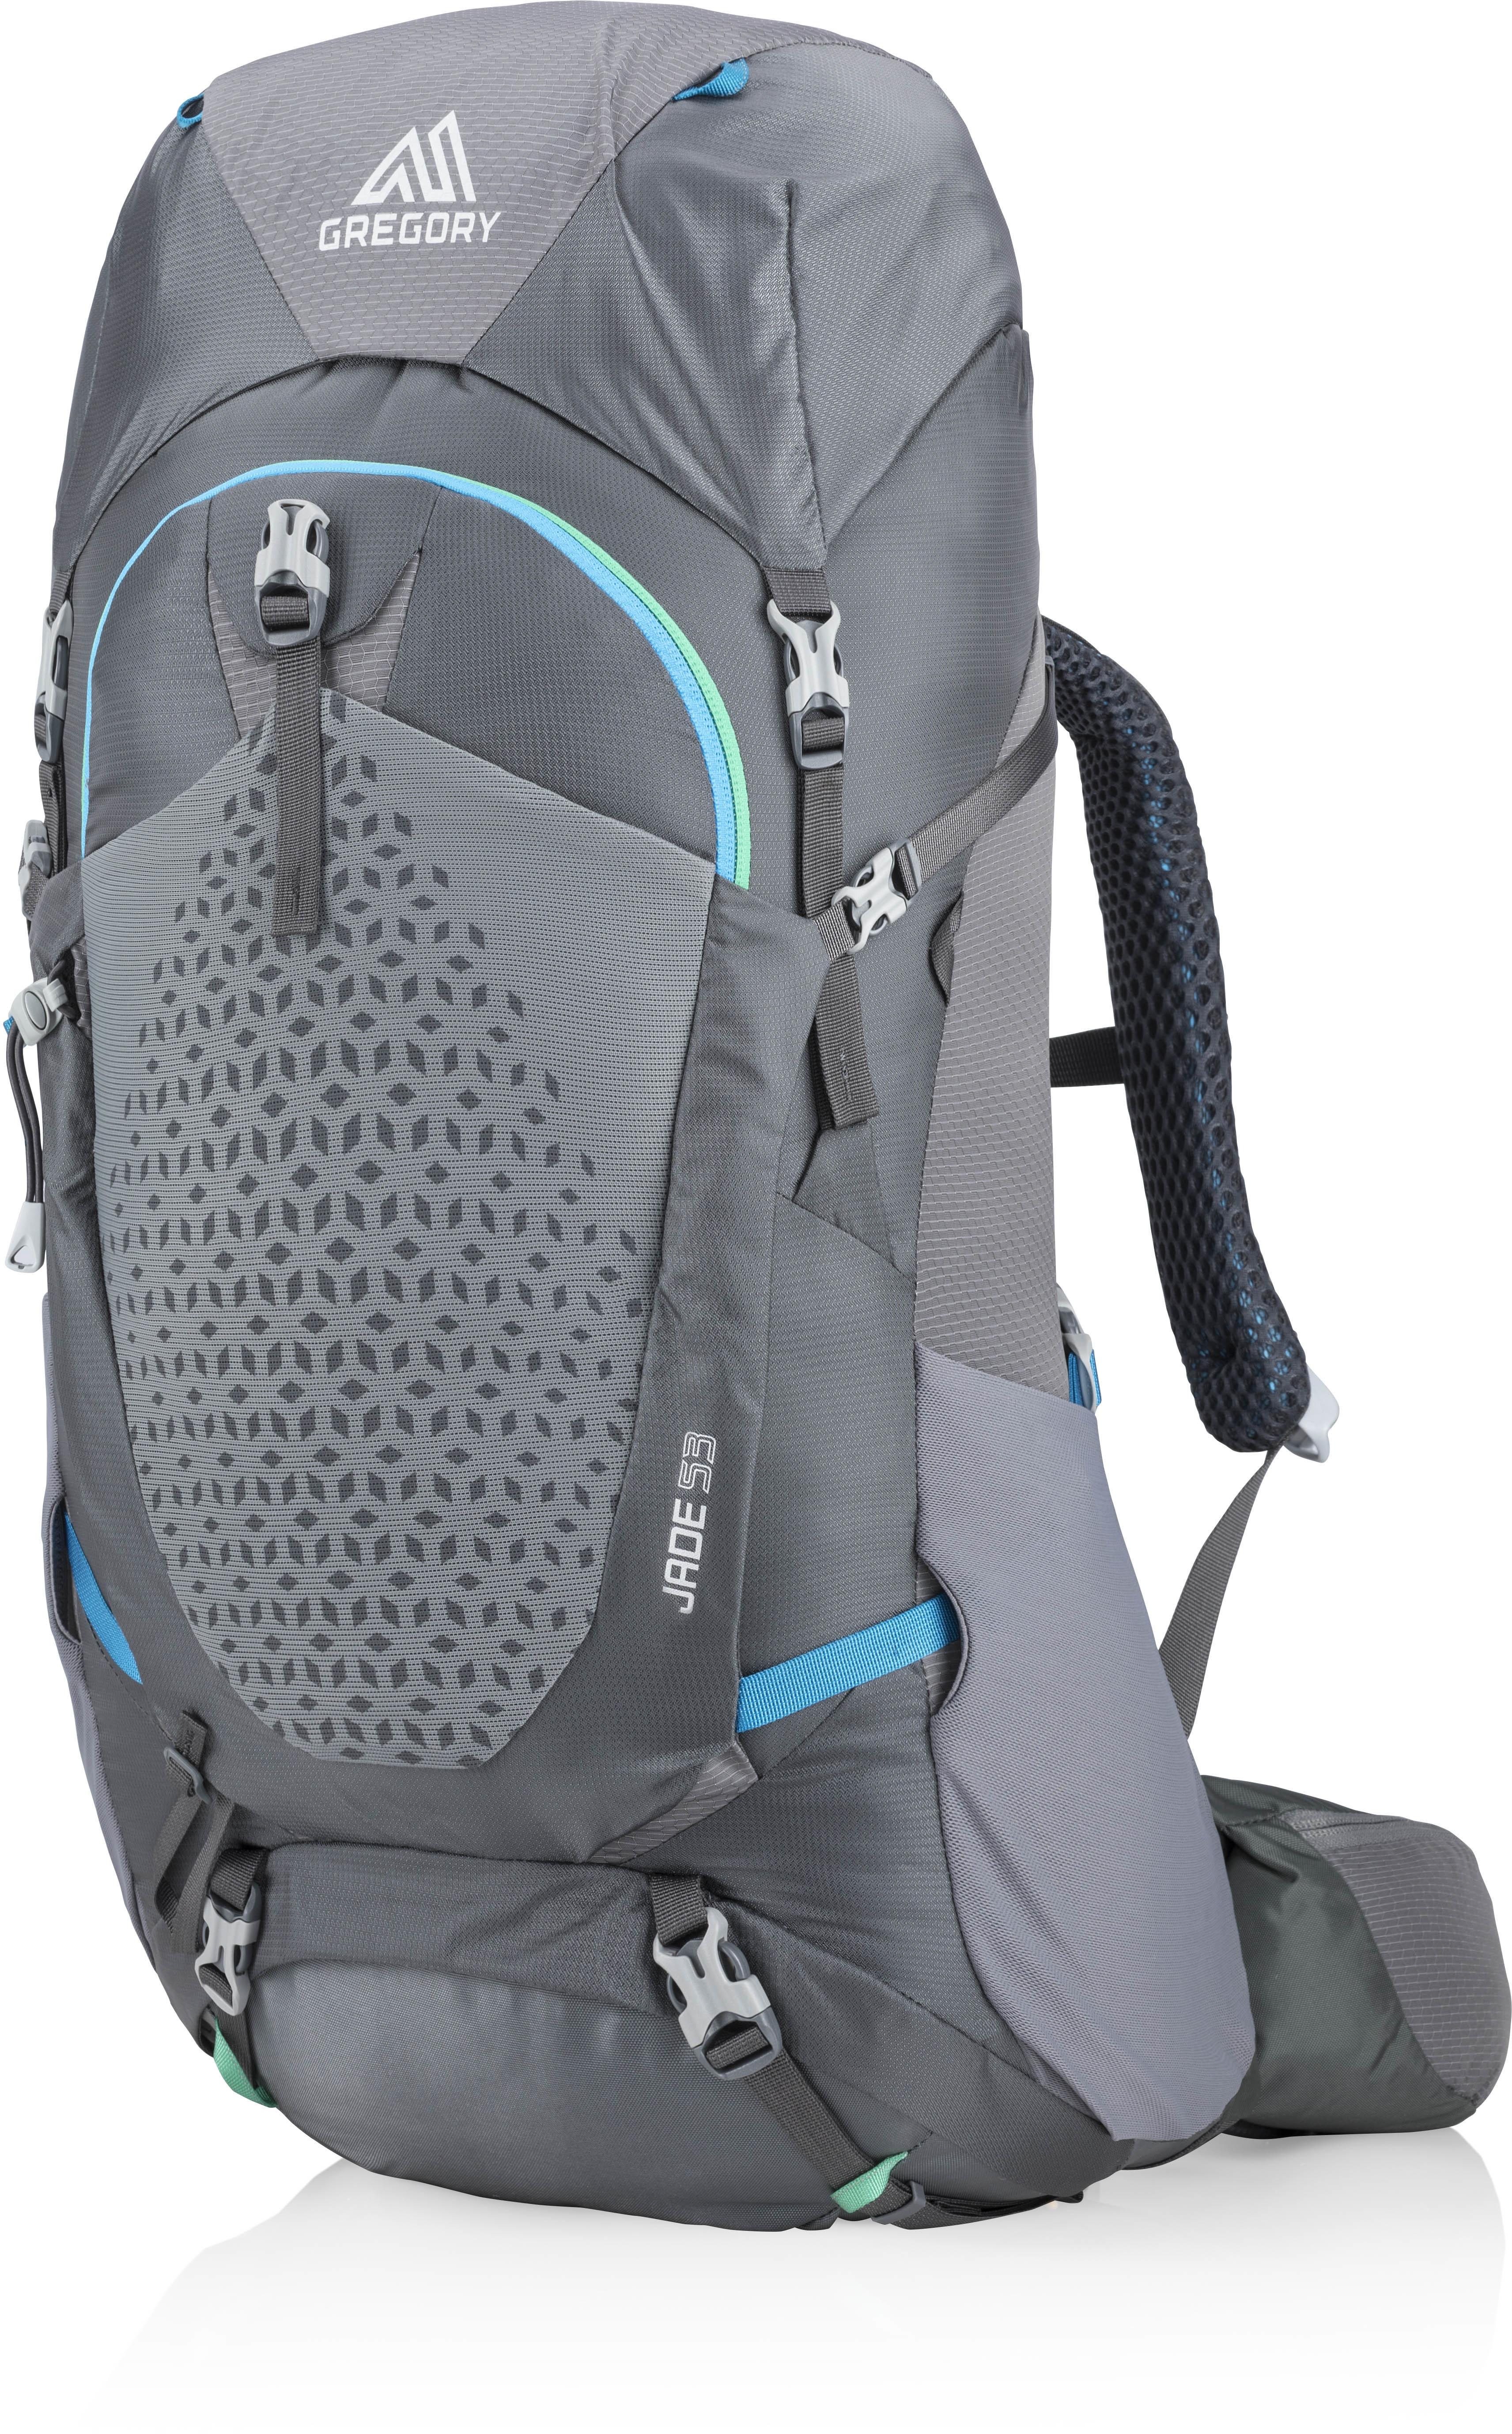 Plecak Jade 53 ethereal grey